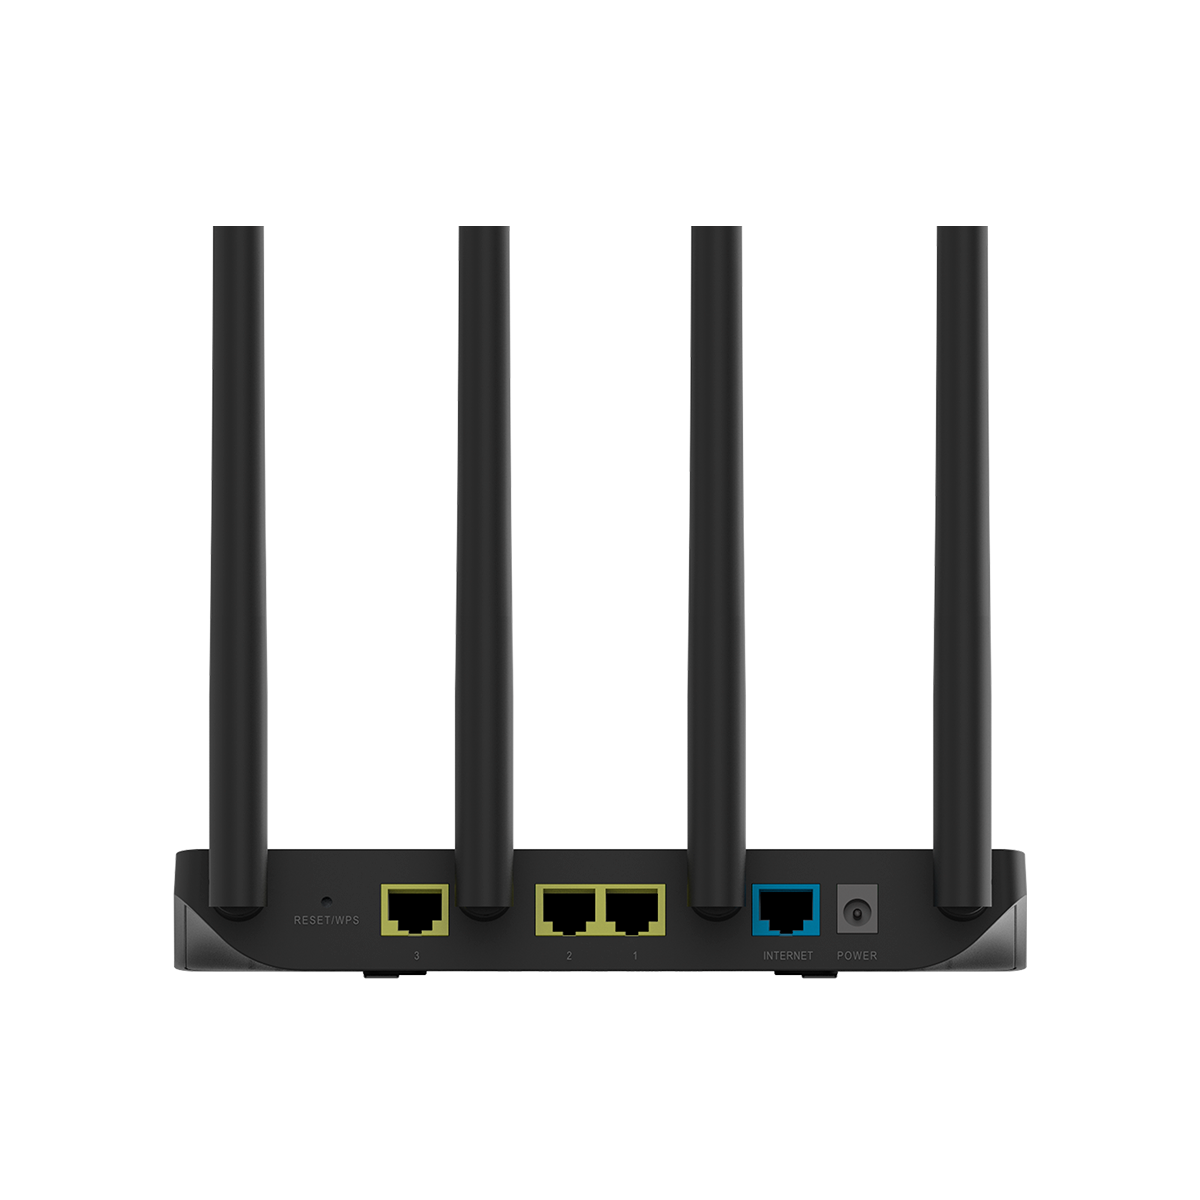 Roteador Wireless Wi-force W5-1200f Dual Band Ac 1200 Intelbras